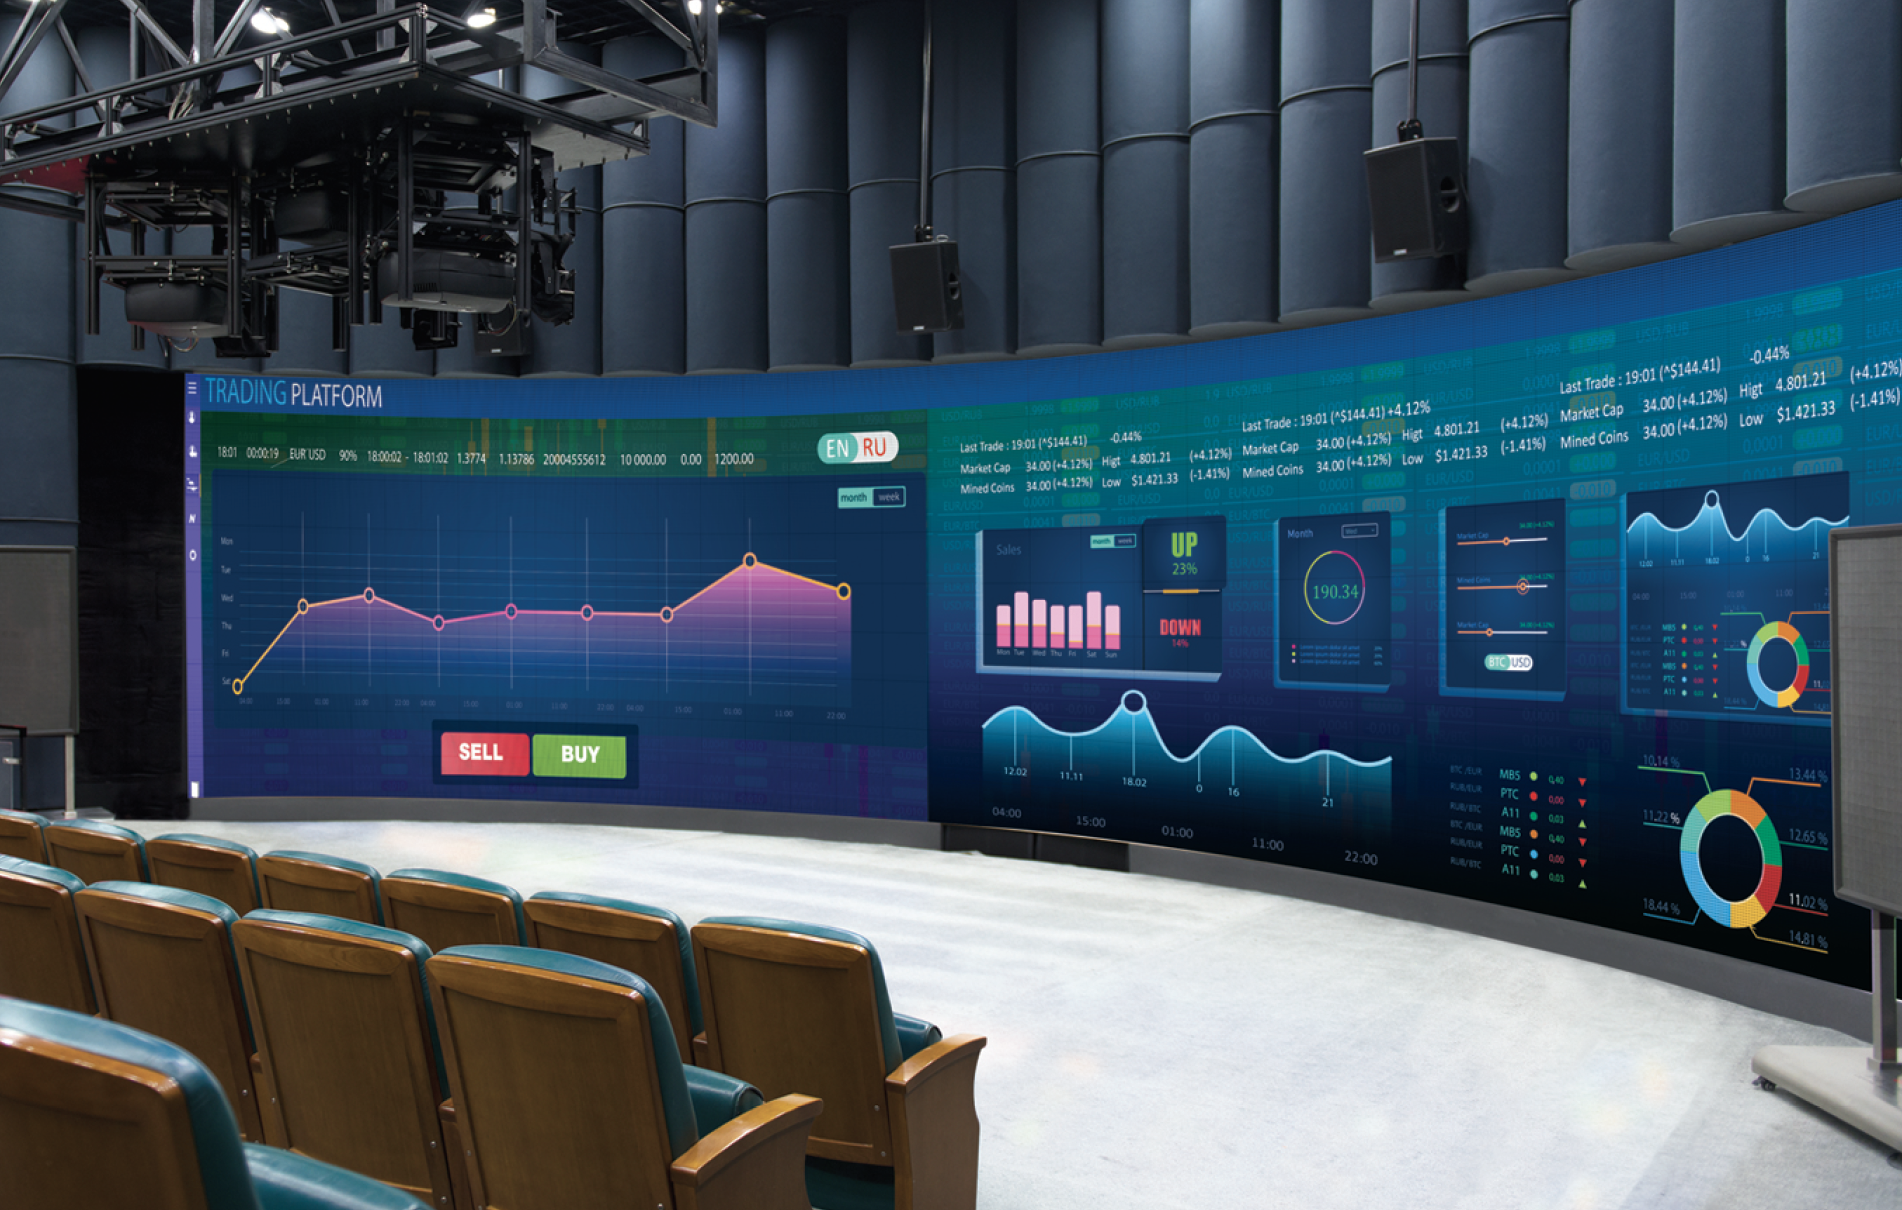 LG Infographic_Webinar_LED Signage_Image Tile